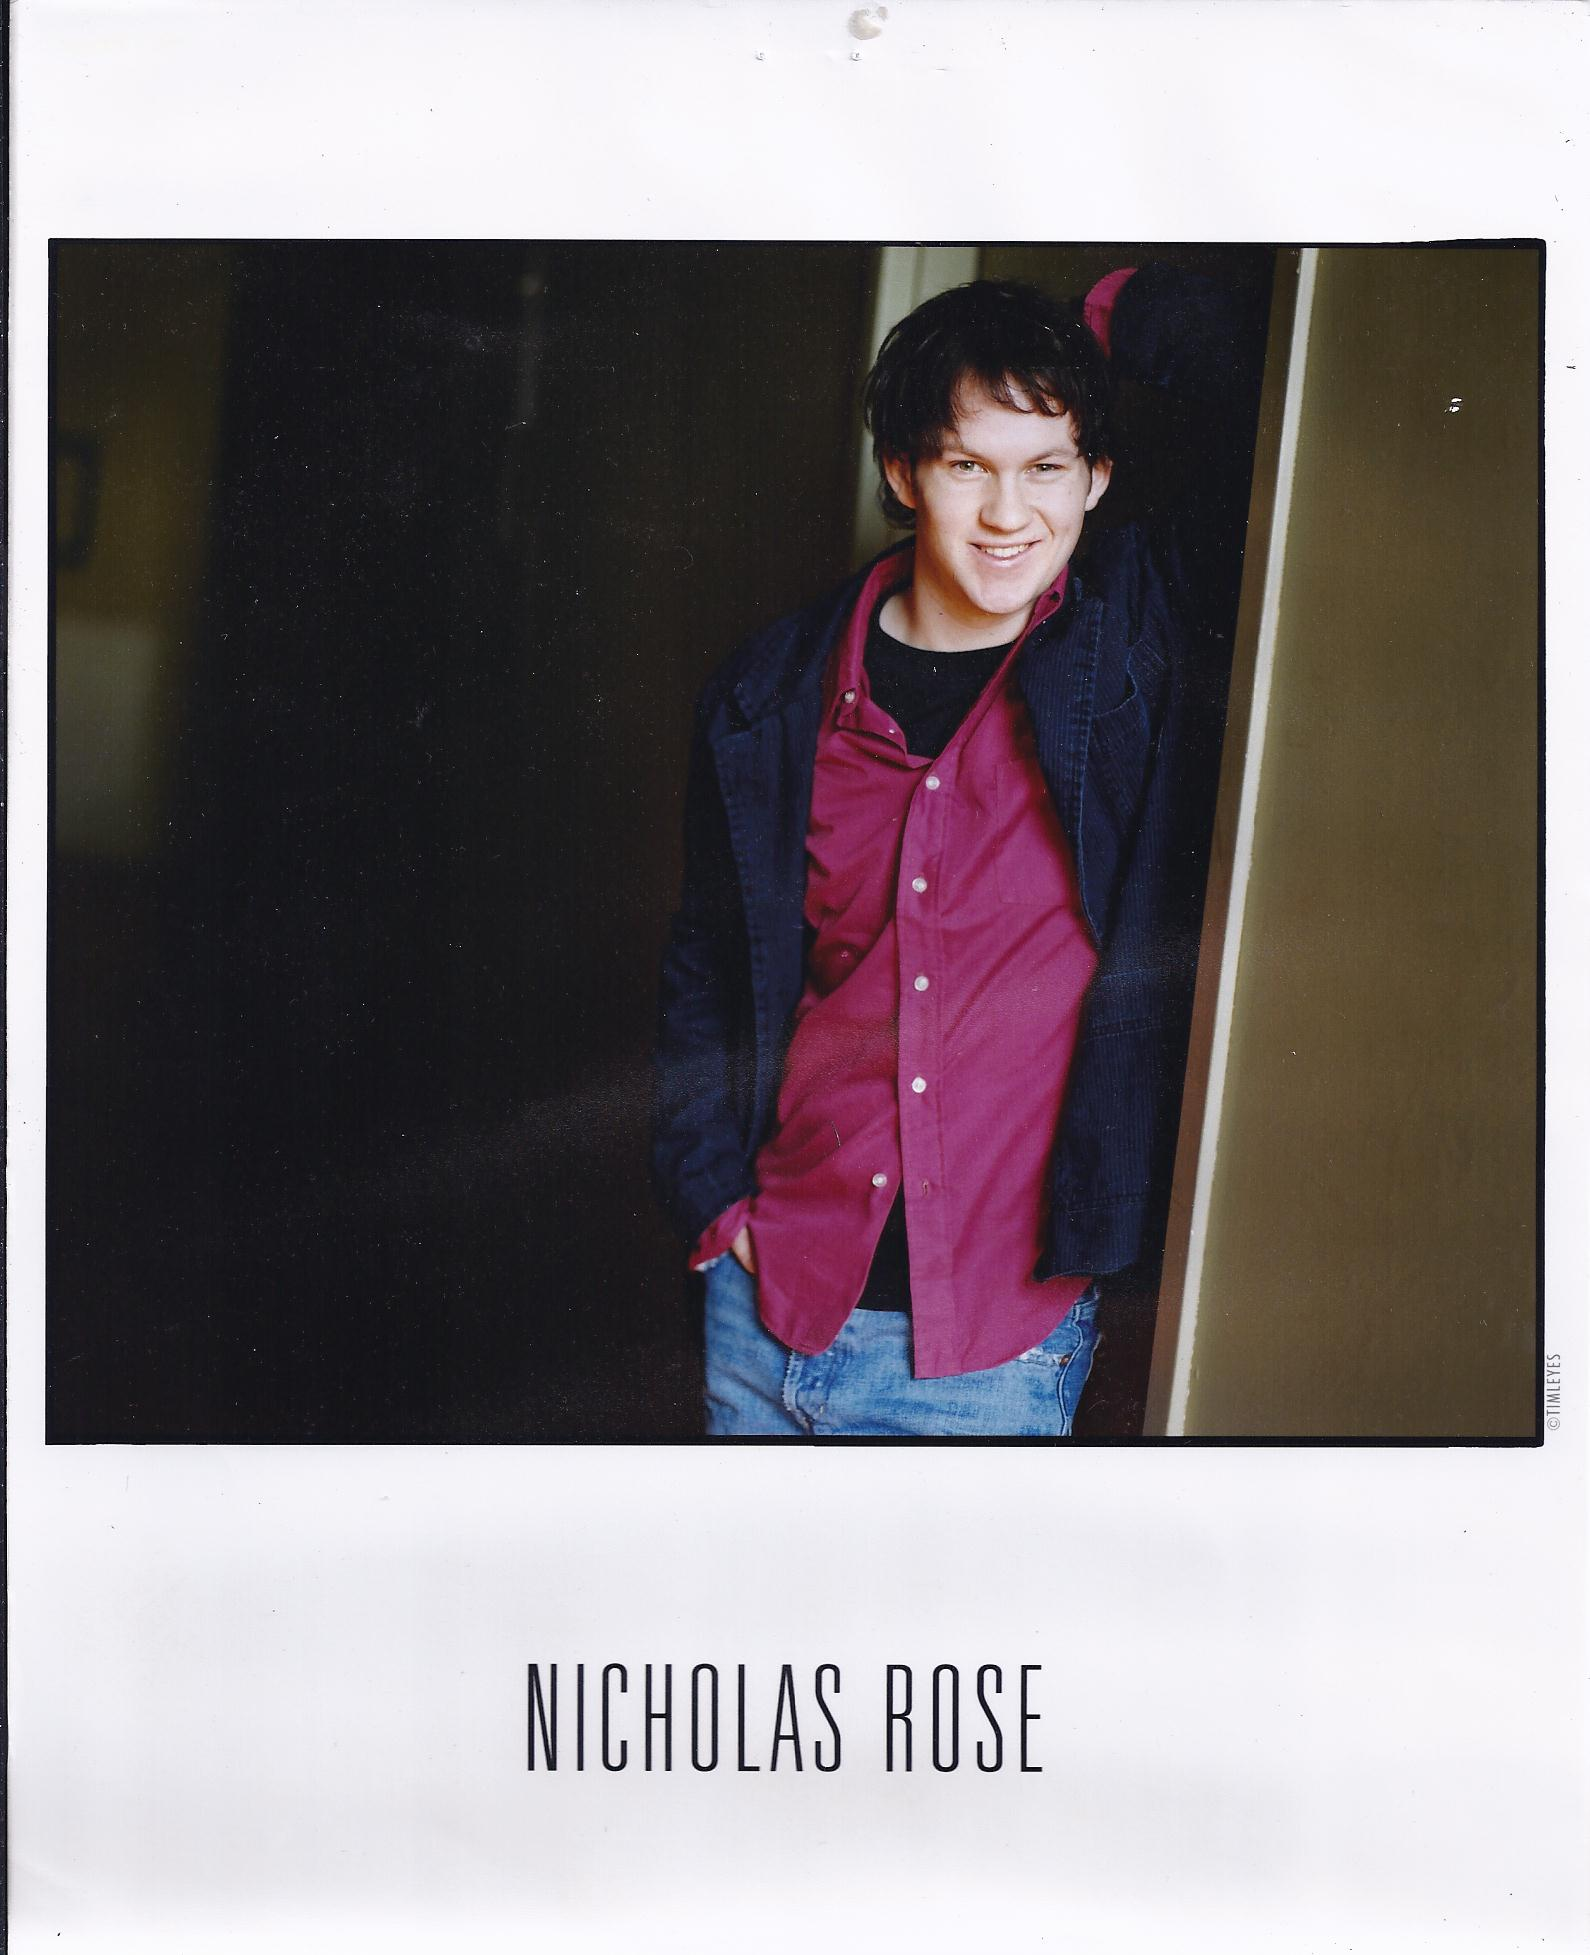 Nicholas Rose